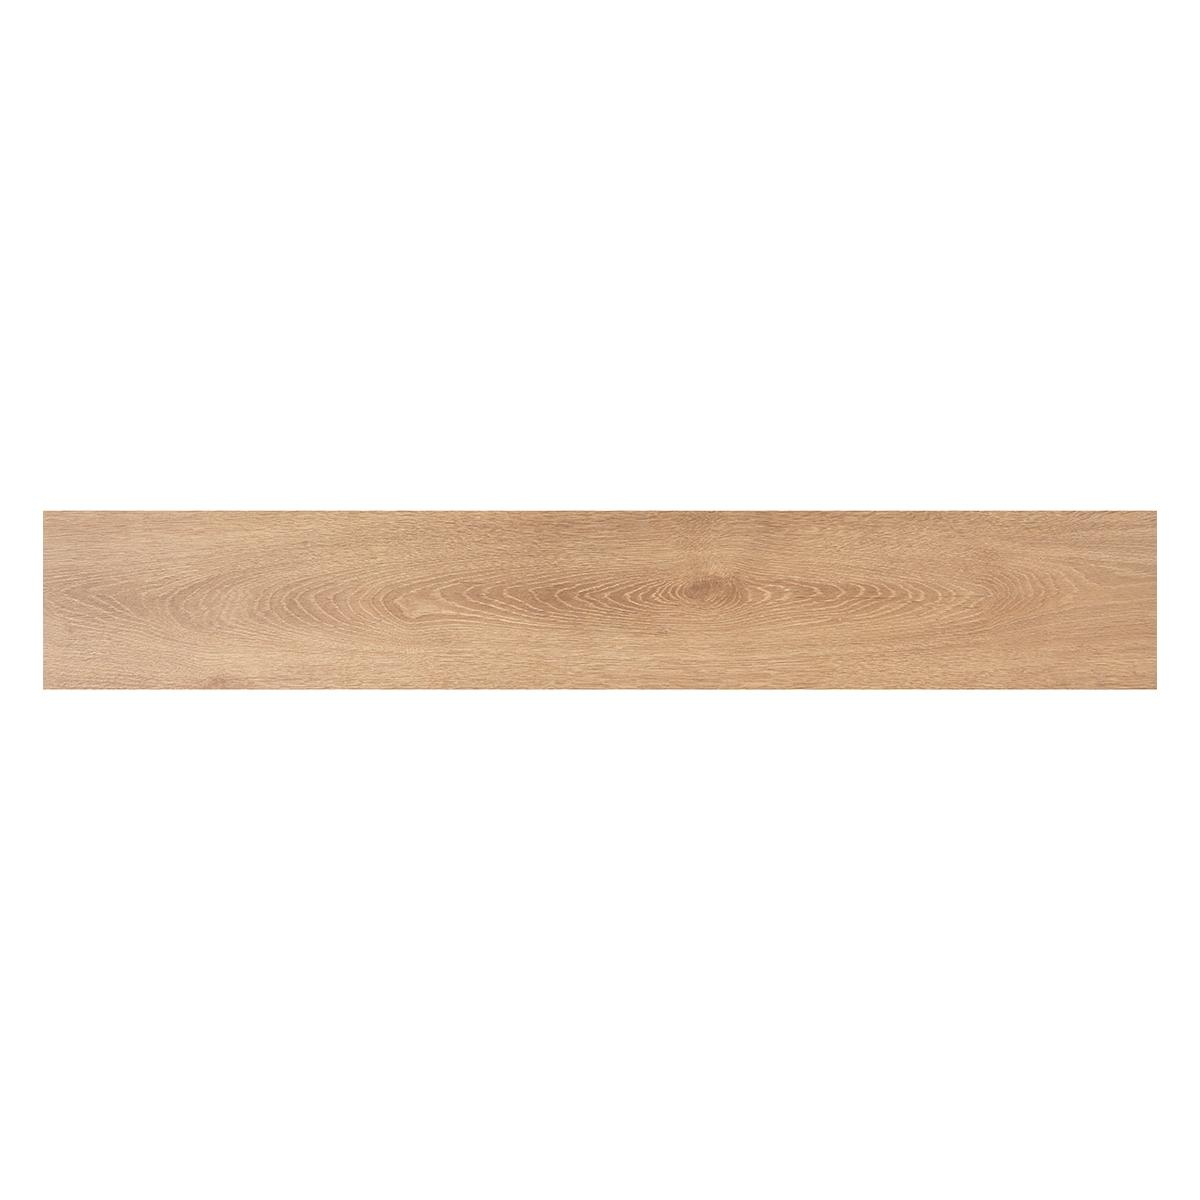 Piso Laminado Argo Navis Roble Oro Mate - 19.9X121.5 - 2.90 m2